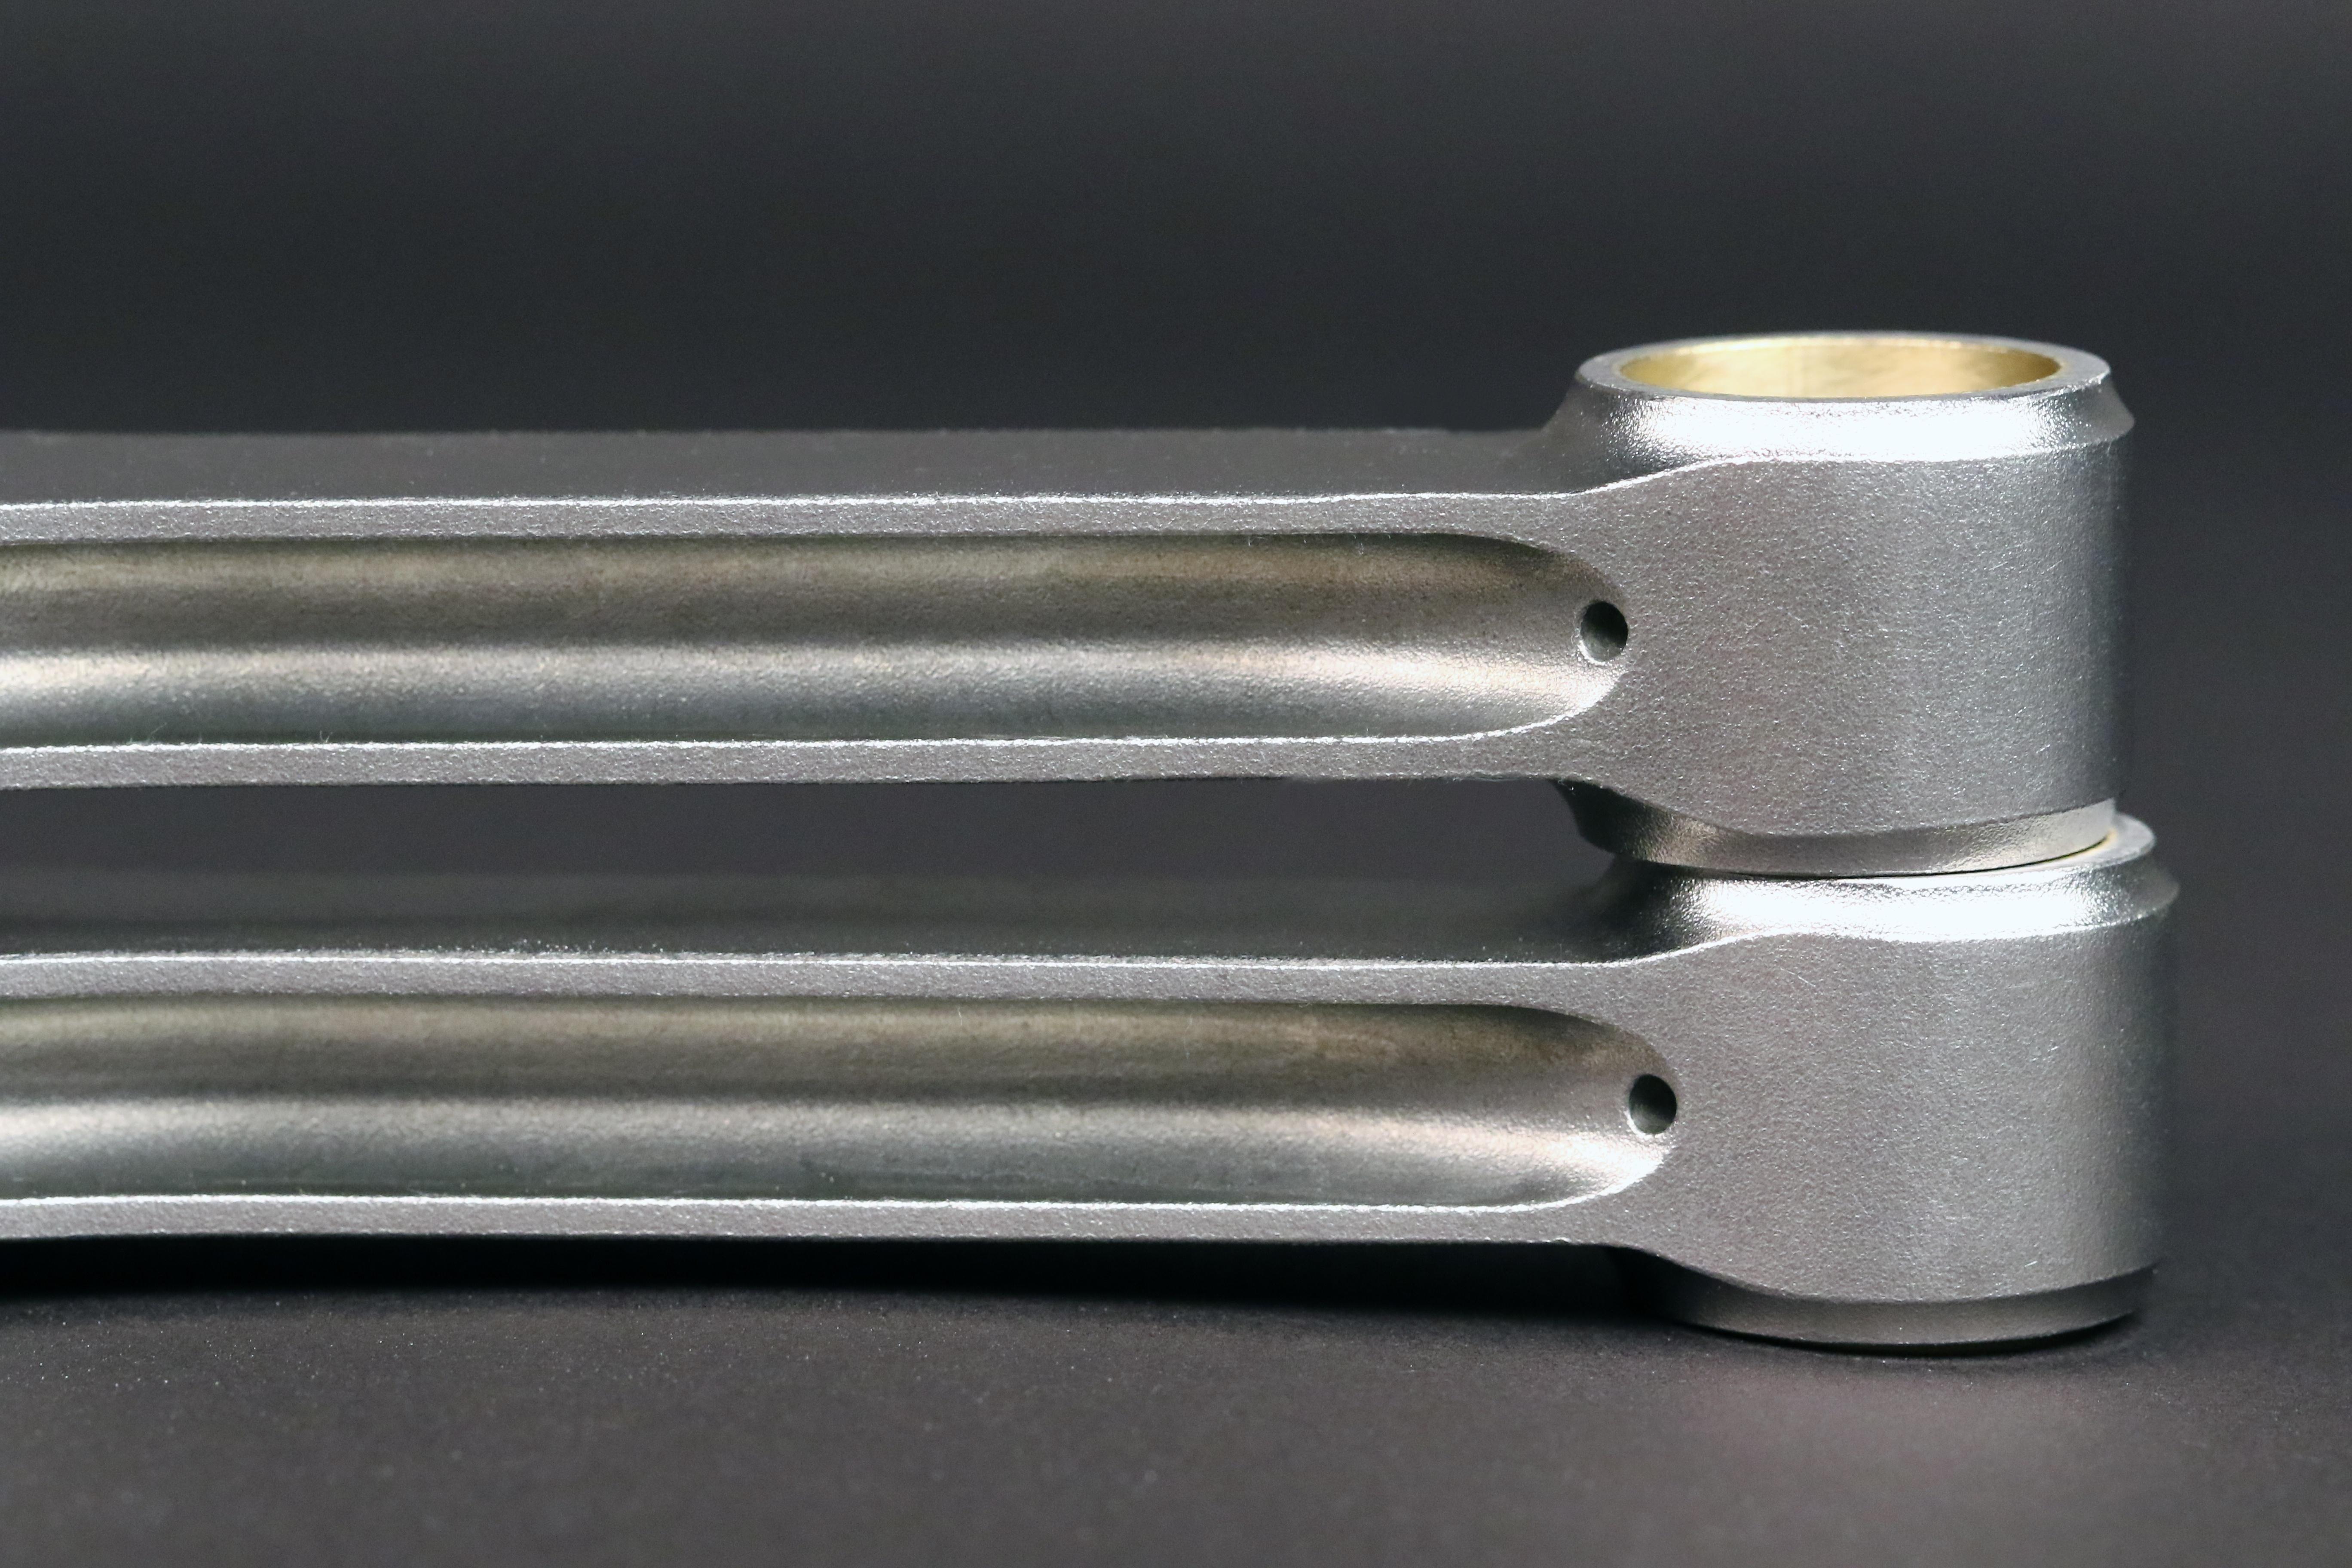 Three's Company: Understanding Rod Length, Piston Compression Height, and Crankshaft Stroke